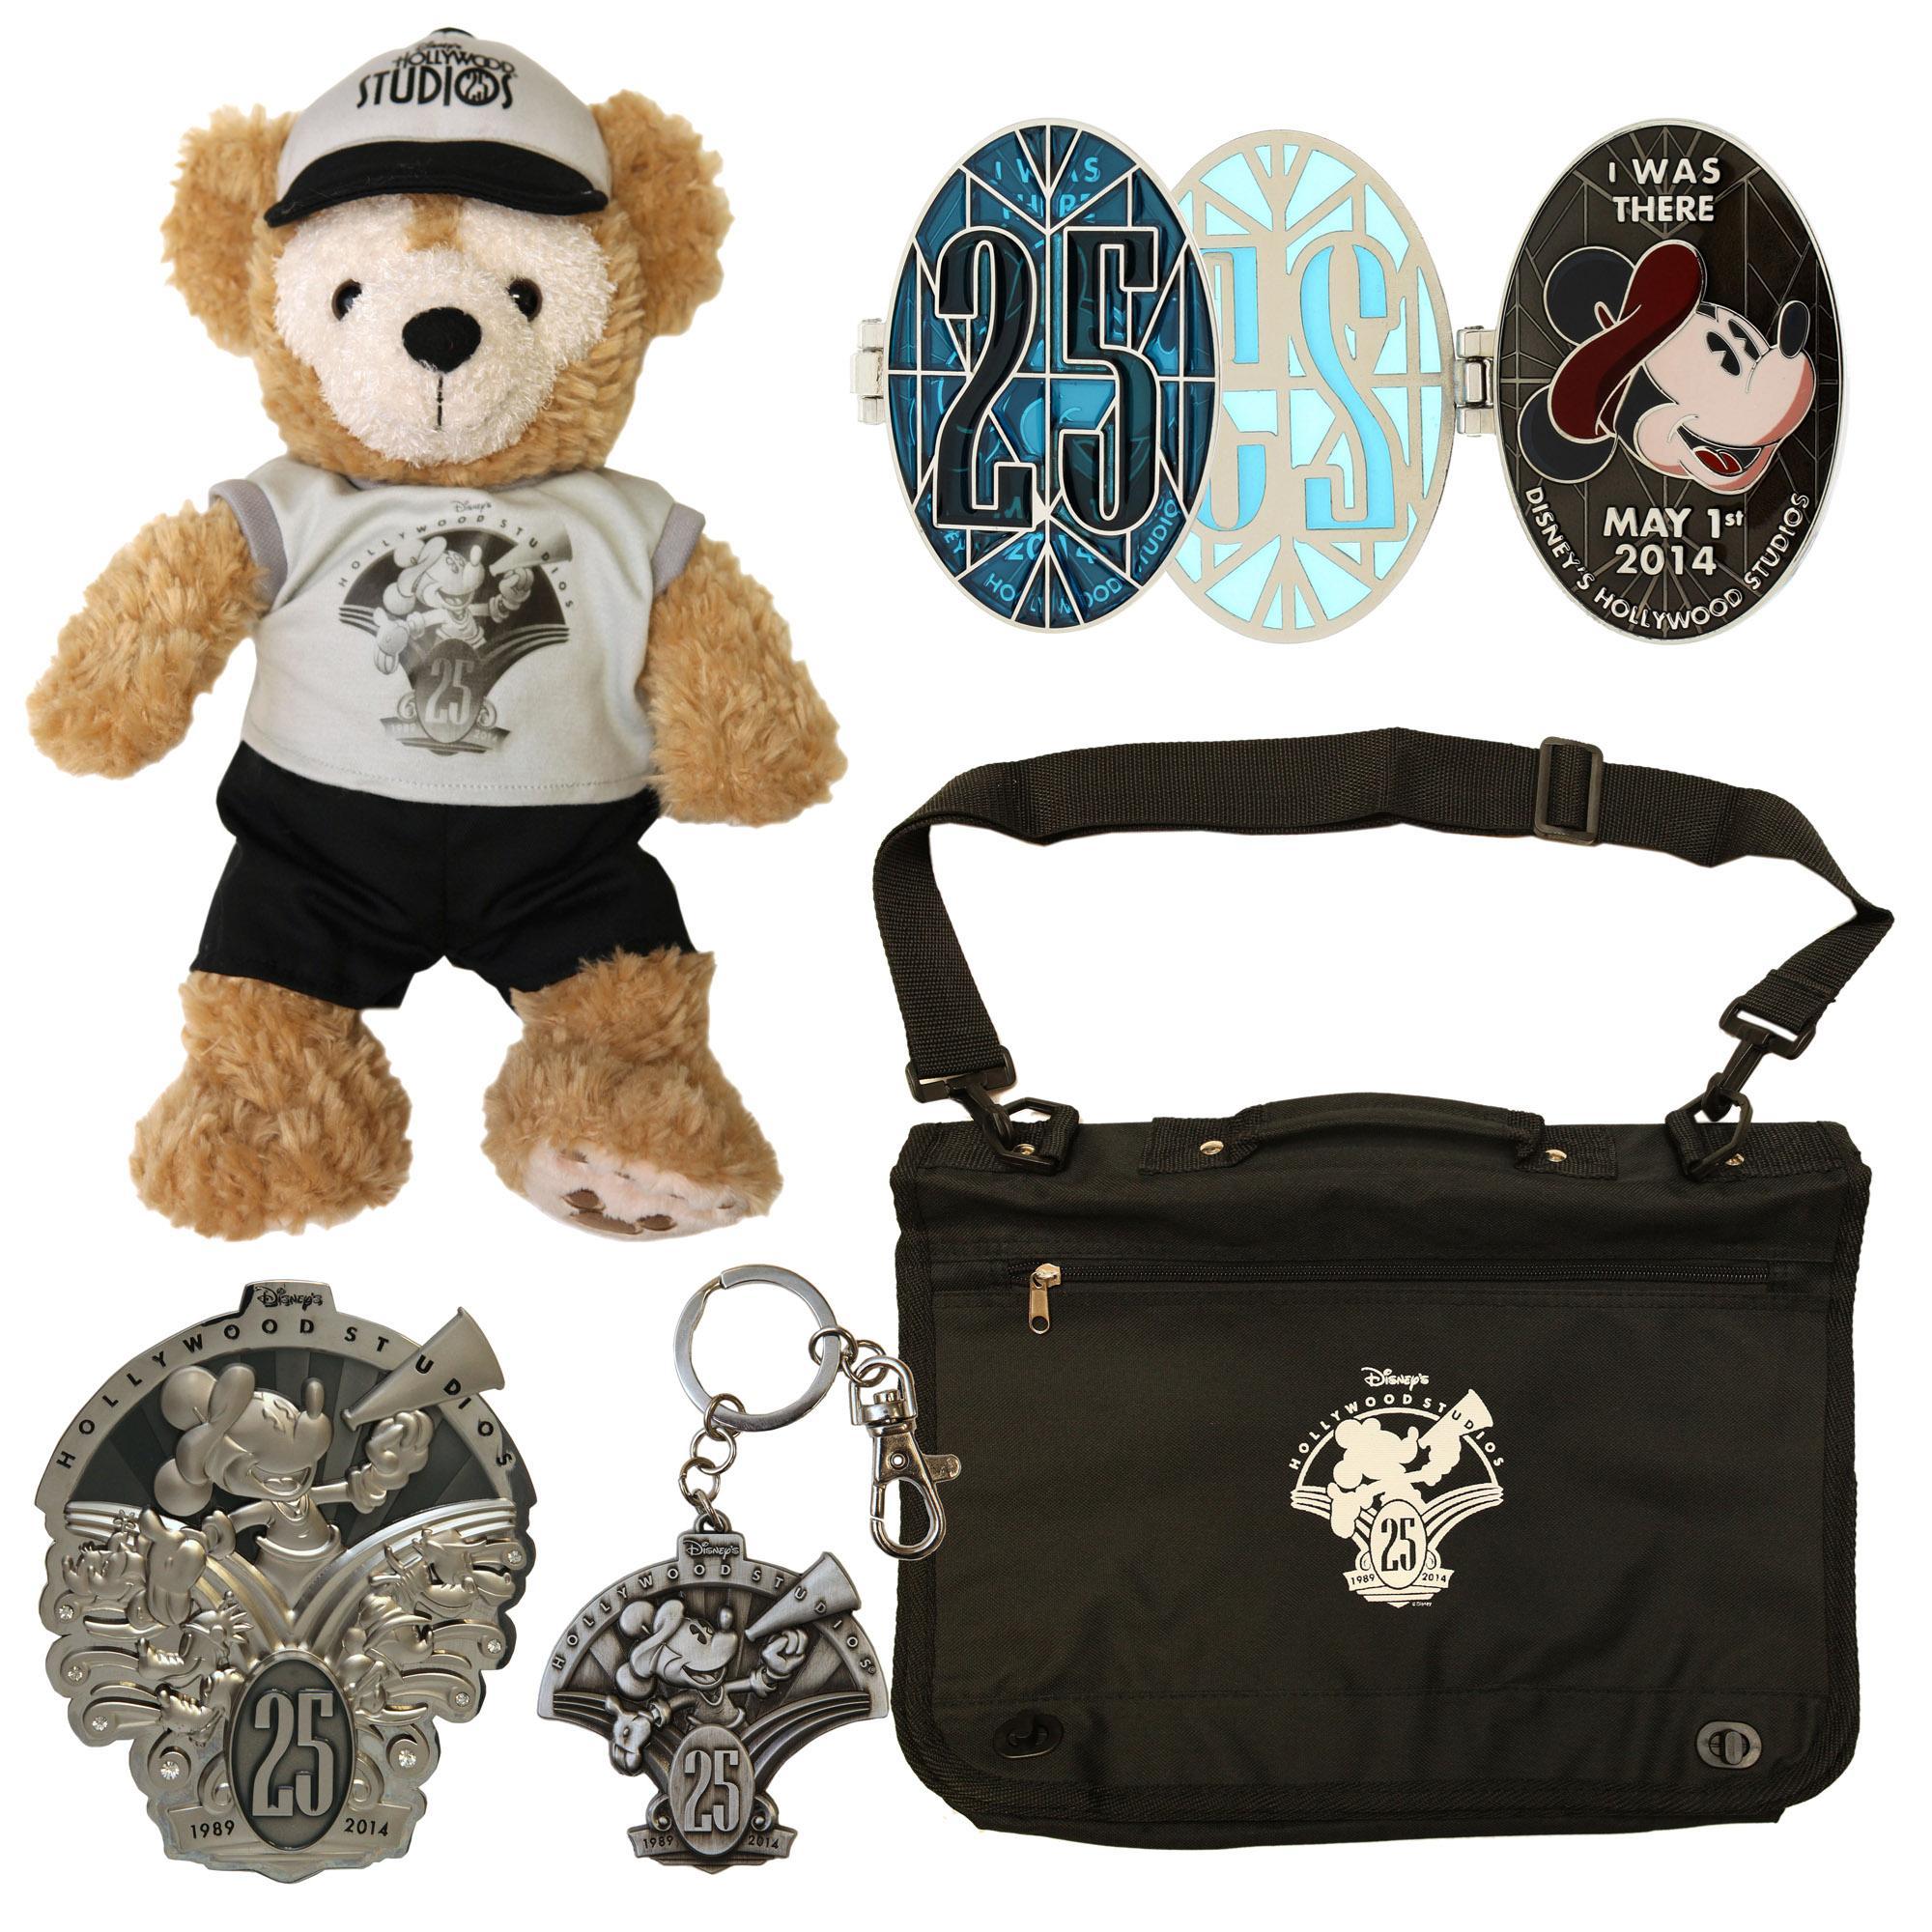 Disney's Hollywood Studios 25th anniversary merchandise - Duffy, Bags